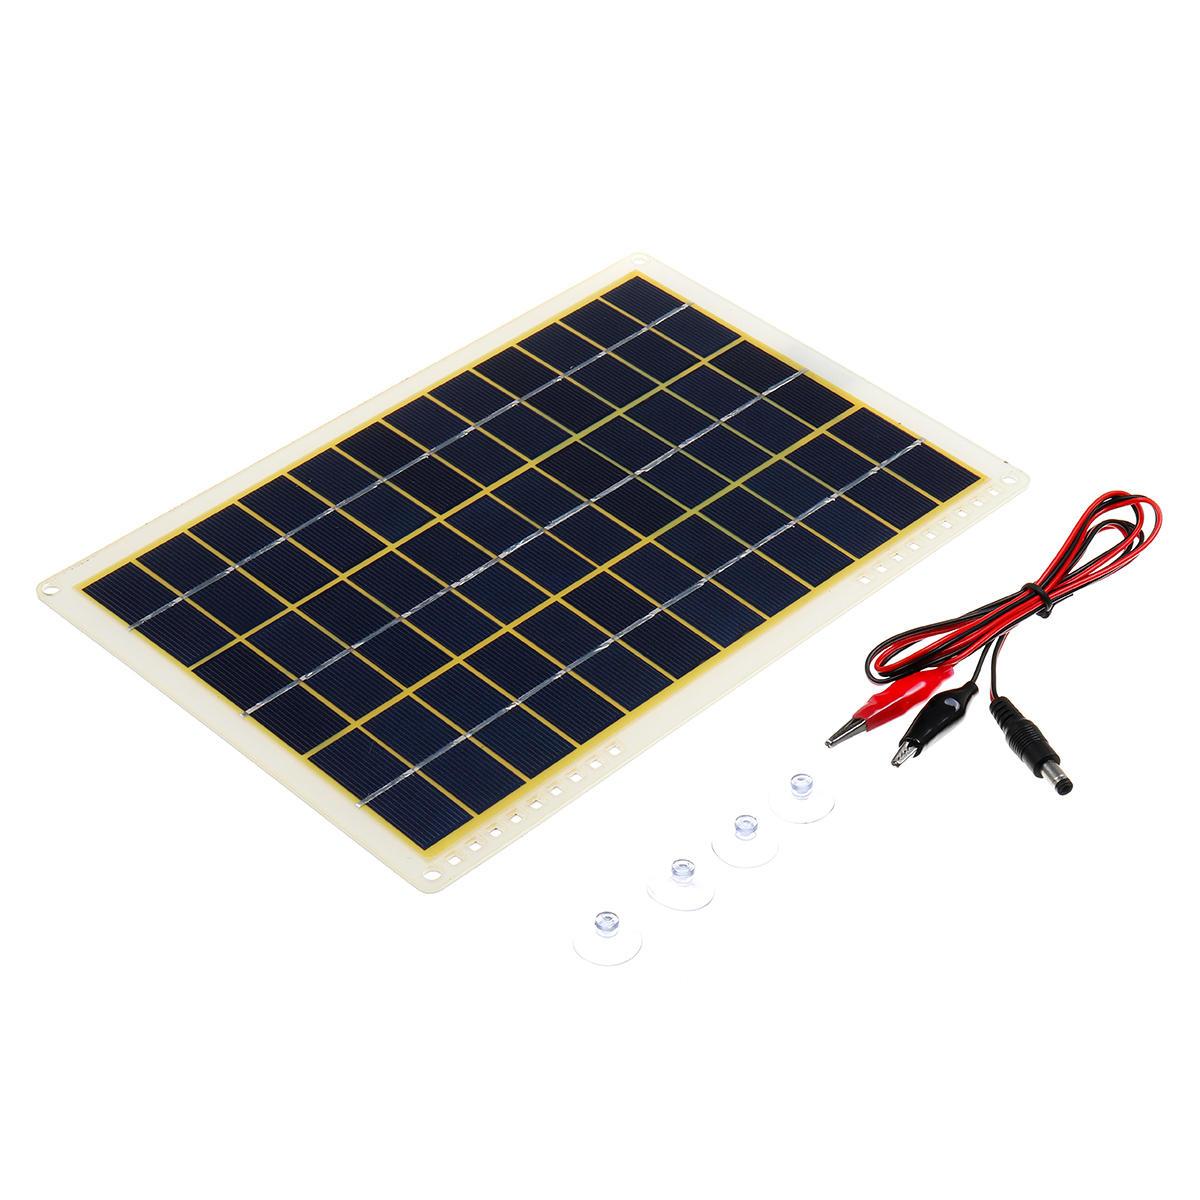 15W 18V 27*19cm IP65 Polycrystalline Solar Panel with USB Port+4Pcs Suction Cups